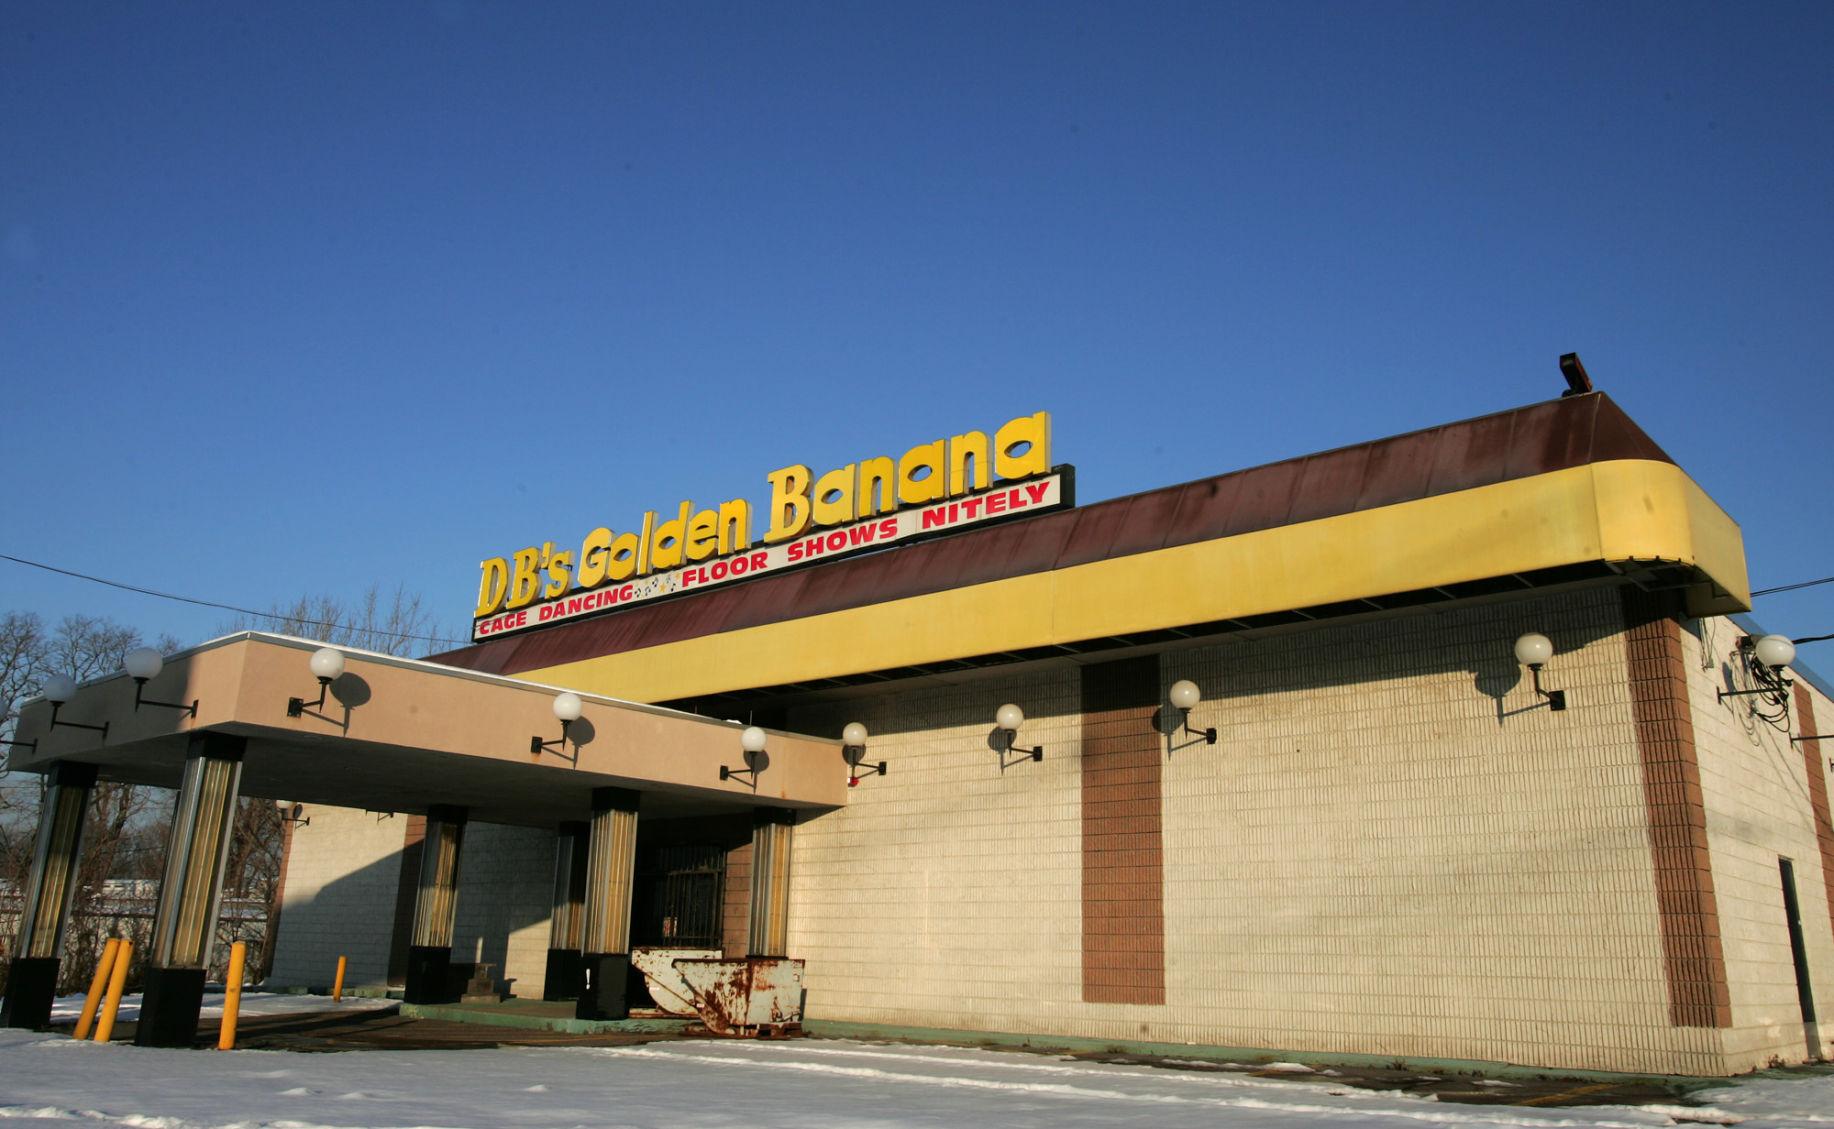 Golden banana strip club